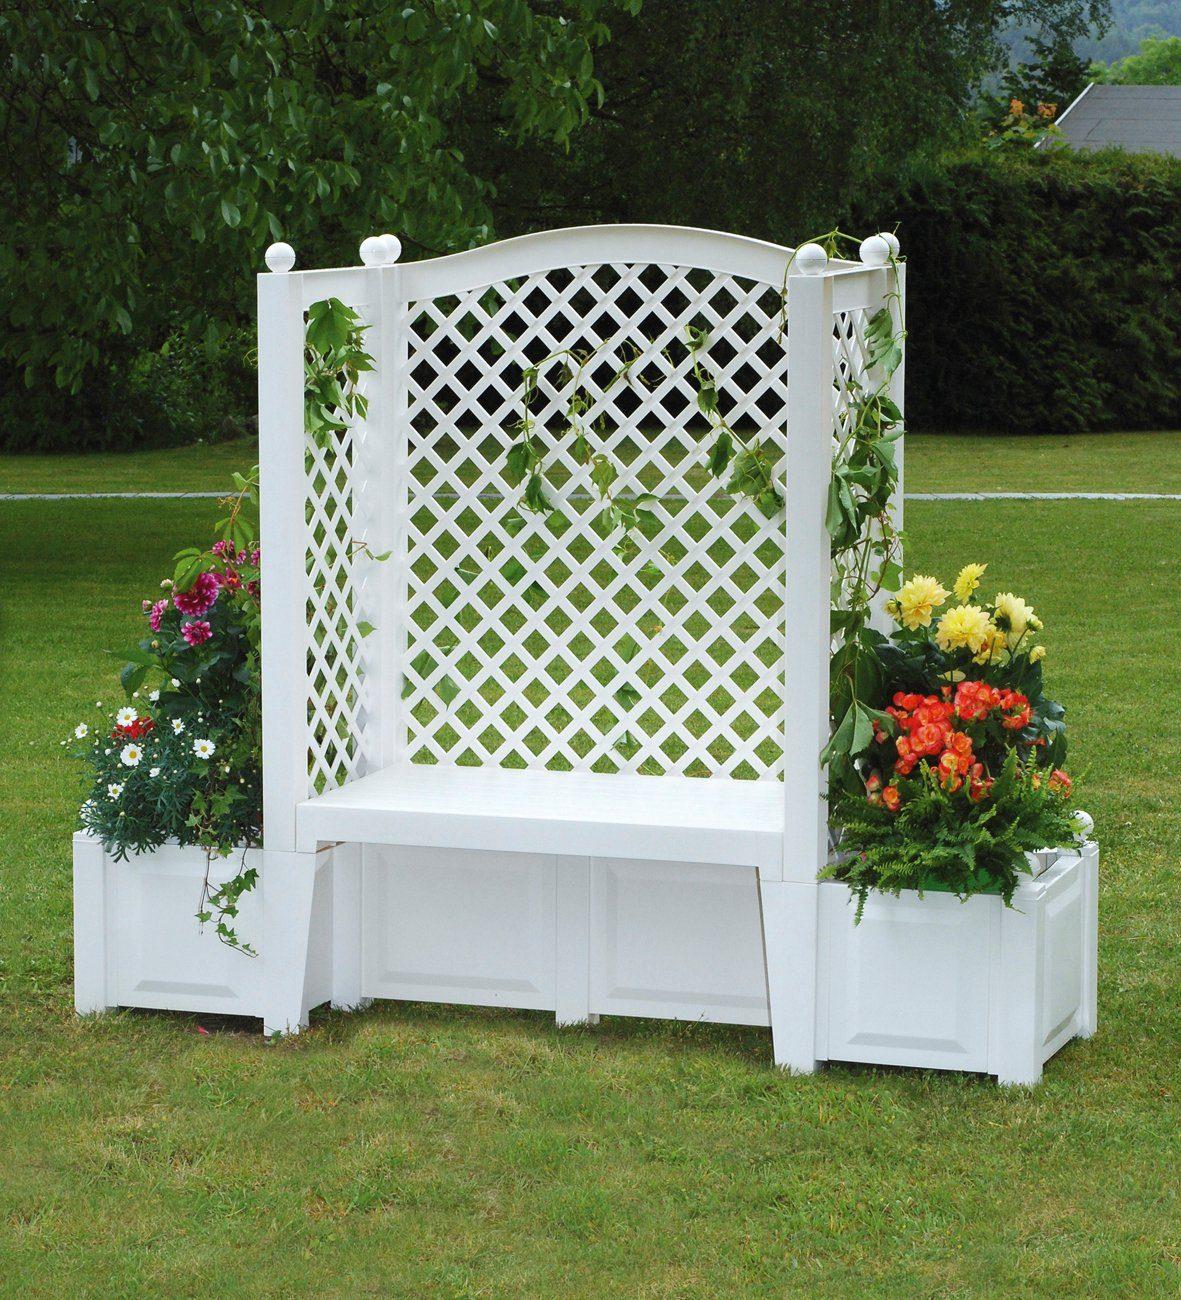 KHW Gartenbank »London«, Kunststoff, 174x49x139 cm, weiß